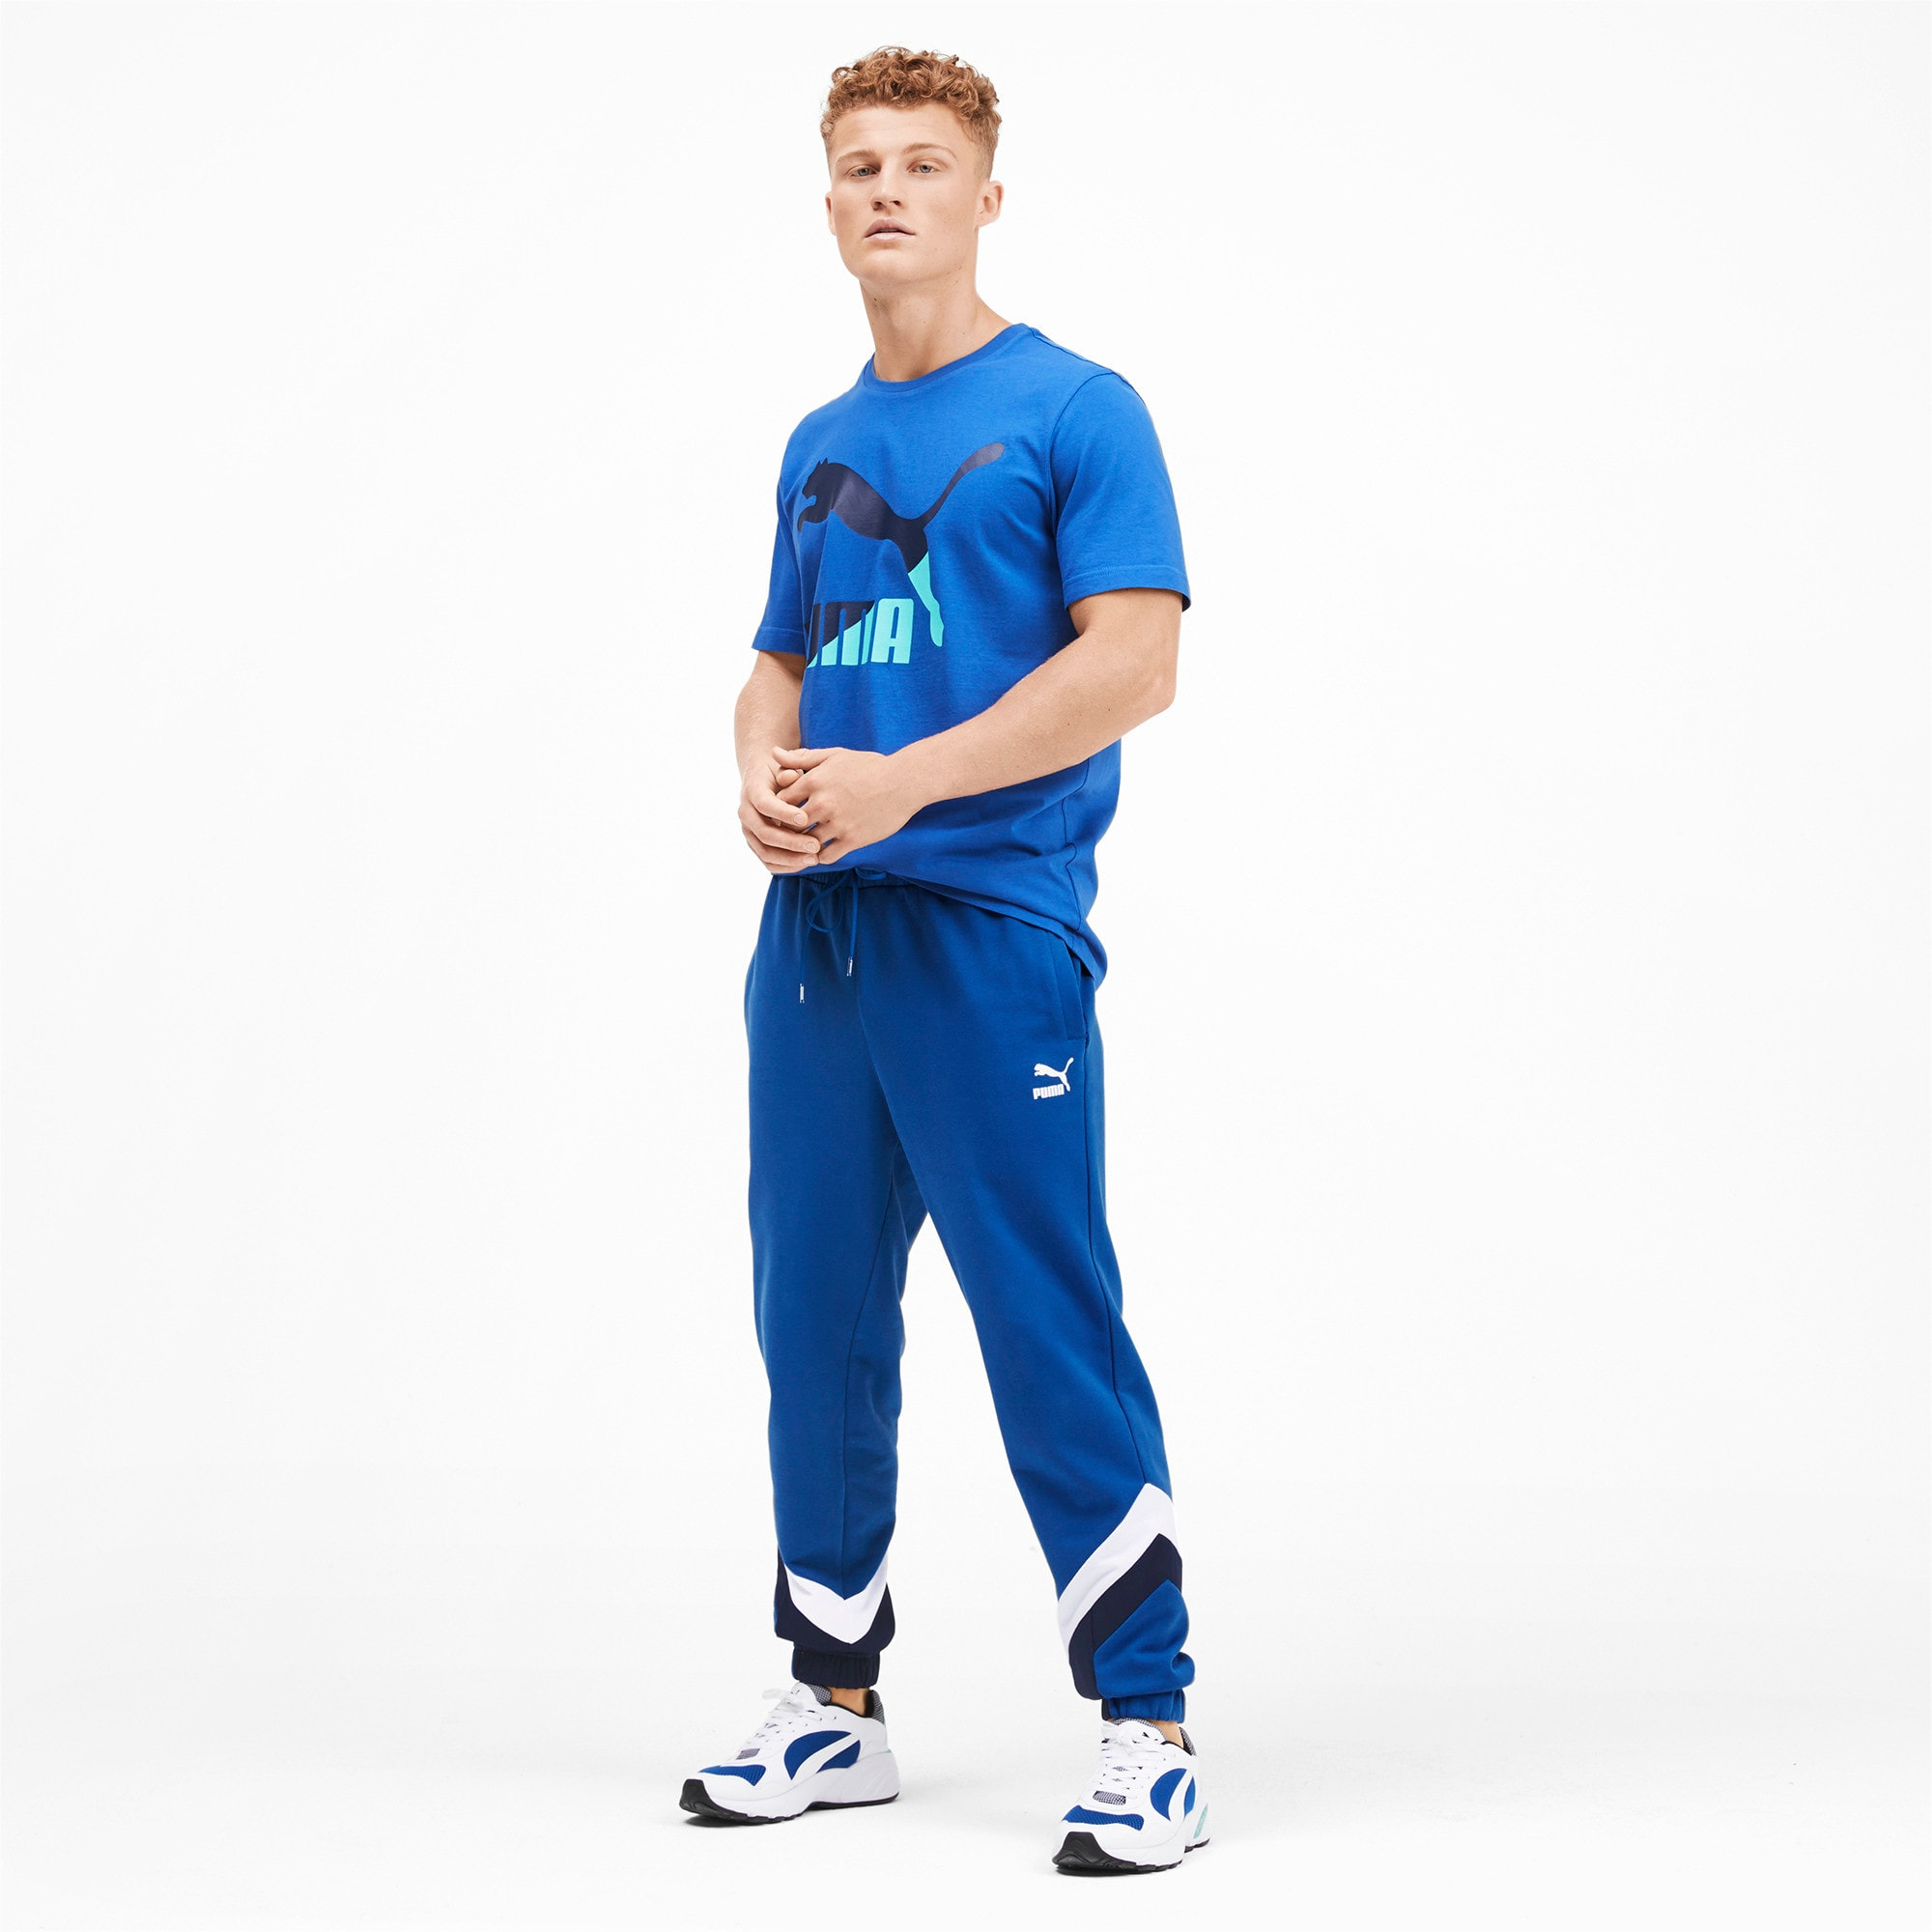 Thumbnail 4 of Iconic MCS Men's Track Pants, Galaxy Blue, medium